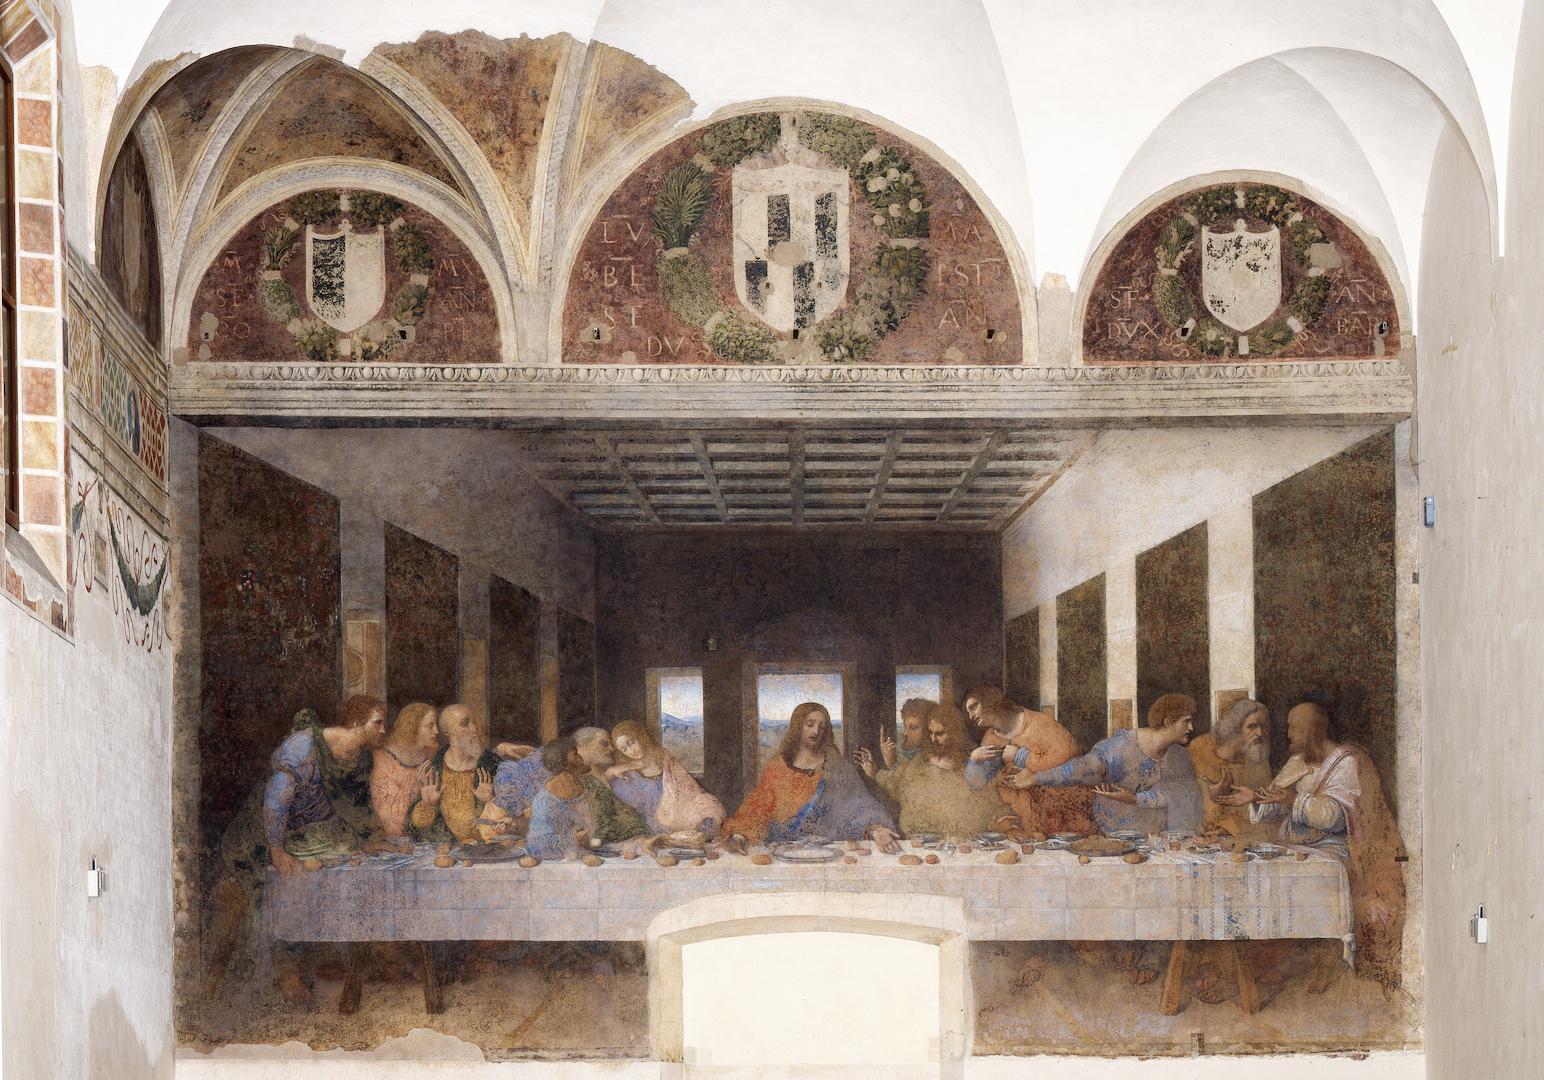 Креативность Eataly & Cenacolo Viniciano